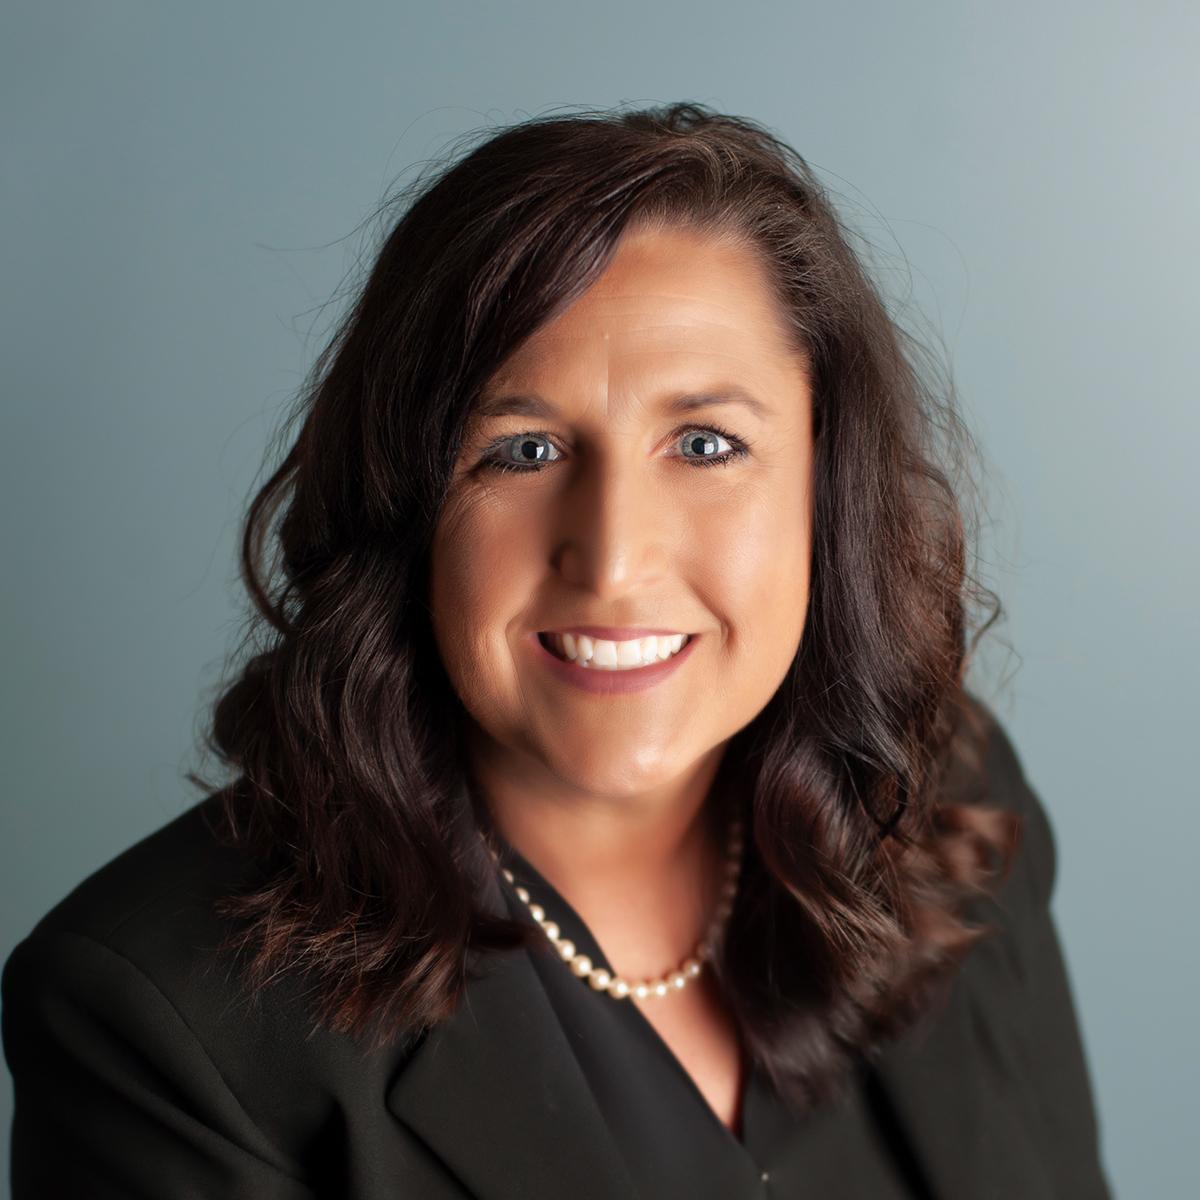 Dr. Holly Acosta